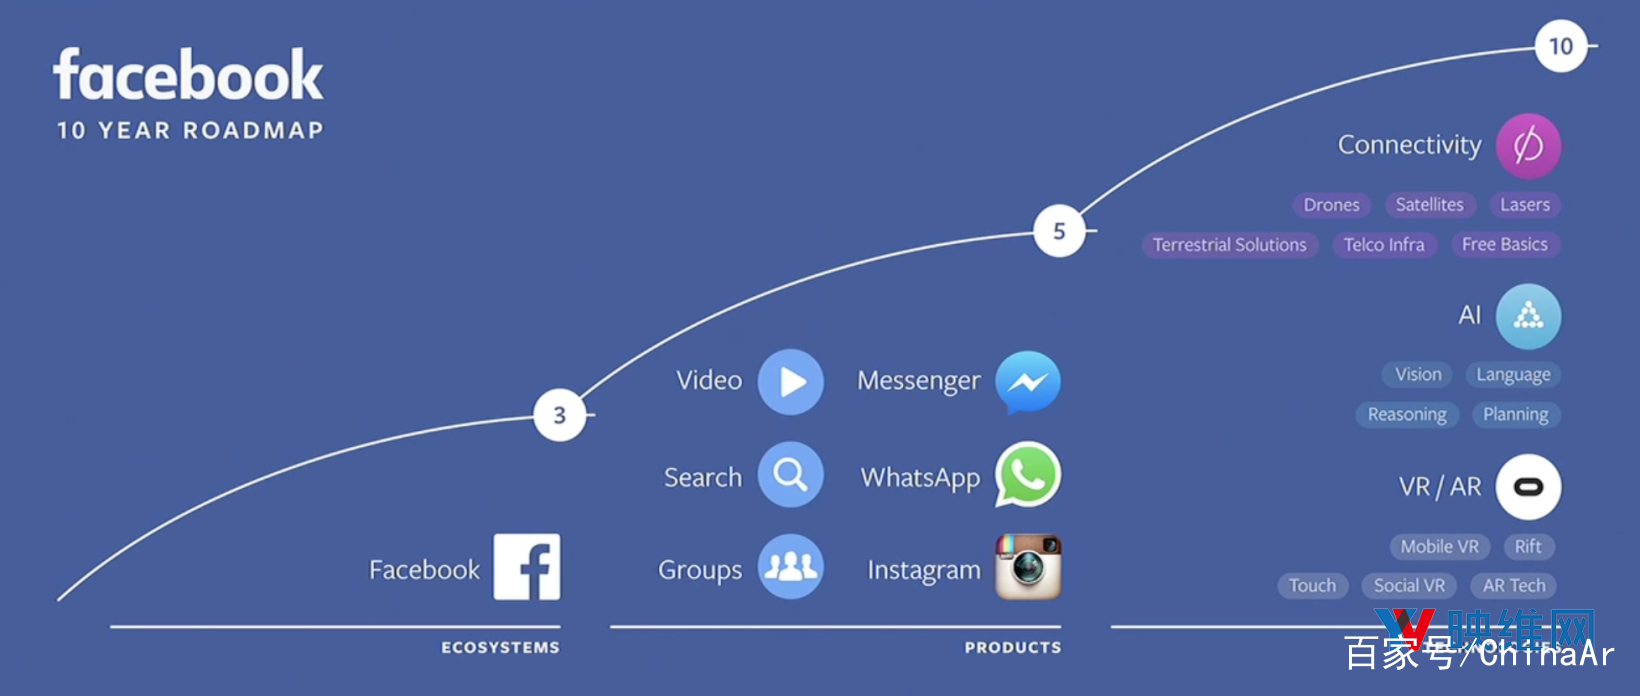 Facebook已做好未来五十年的AR/VR征途 AR资讯